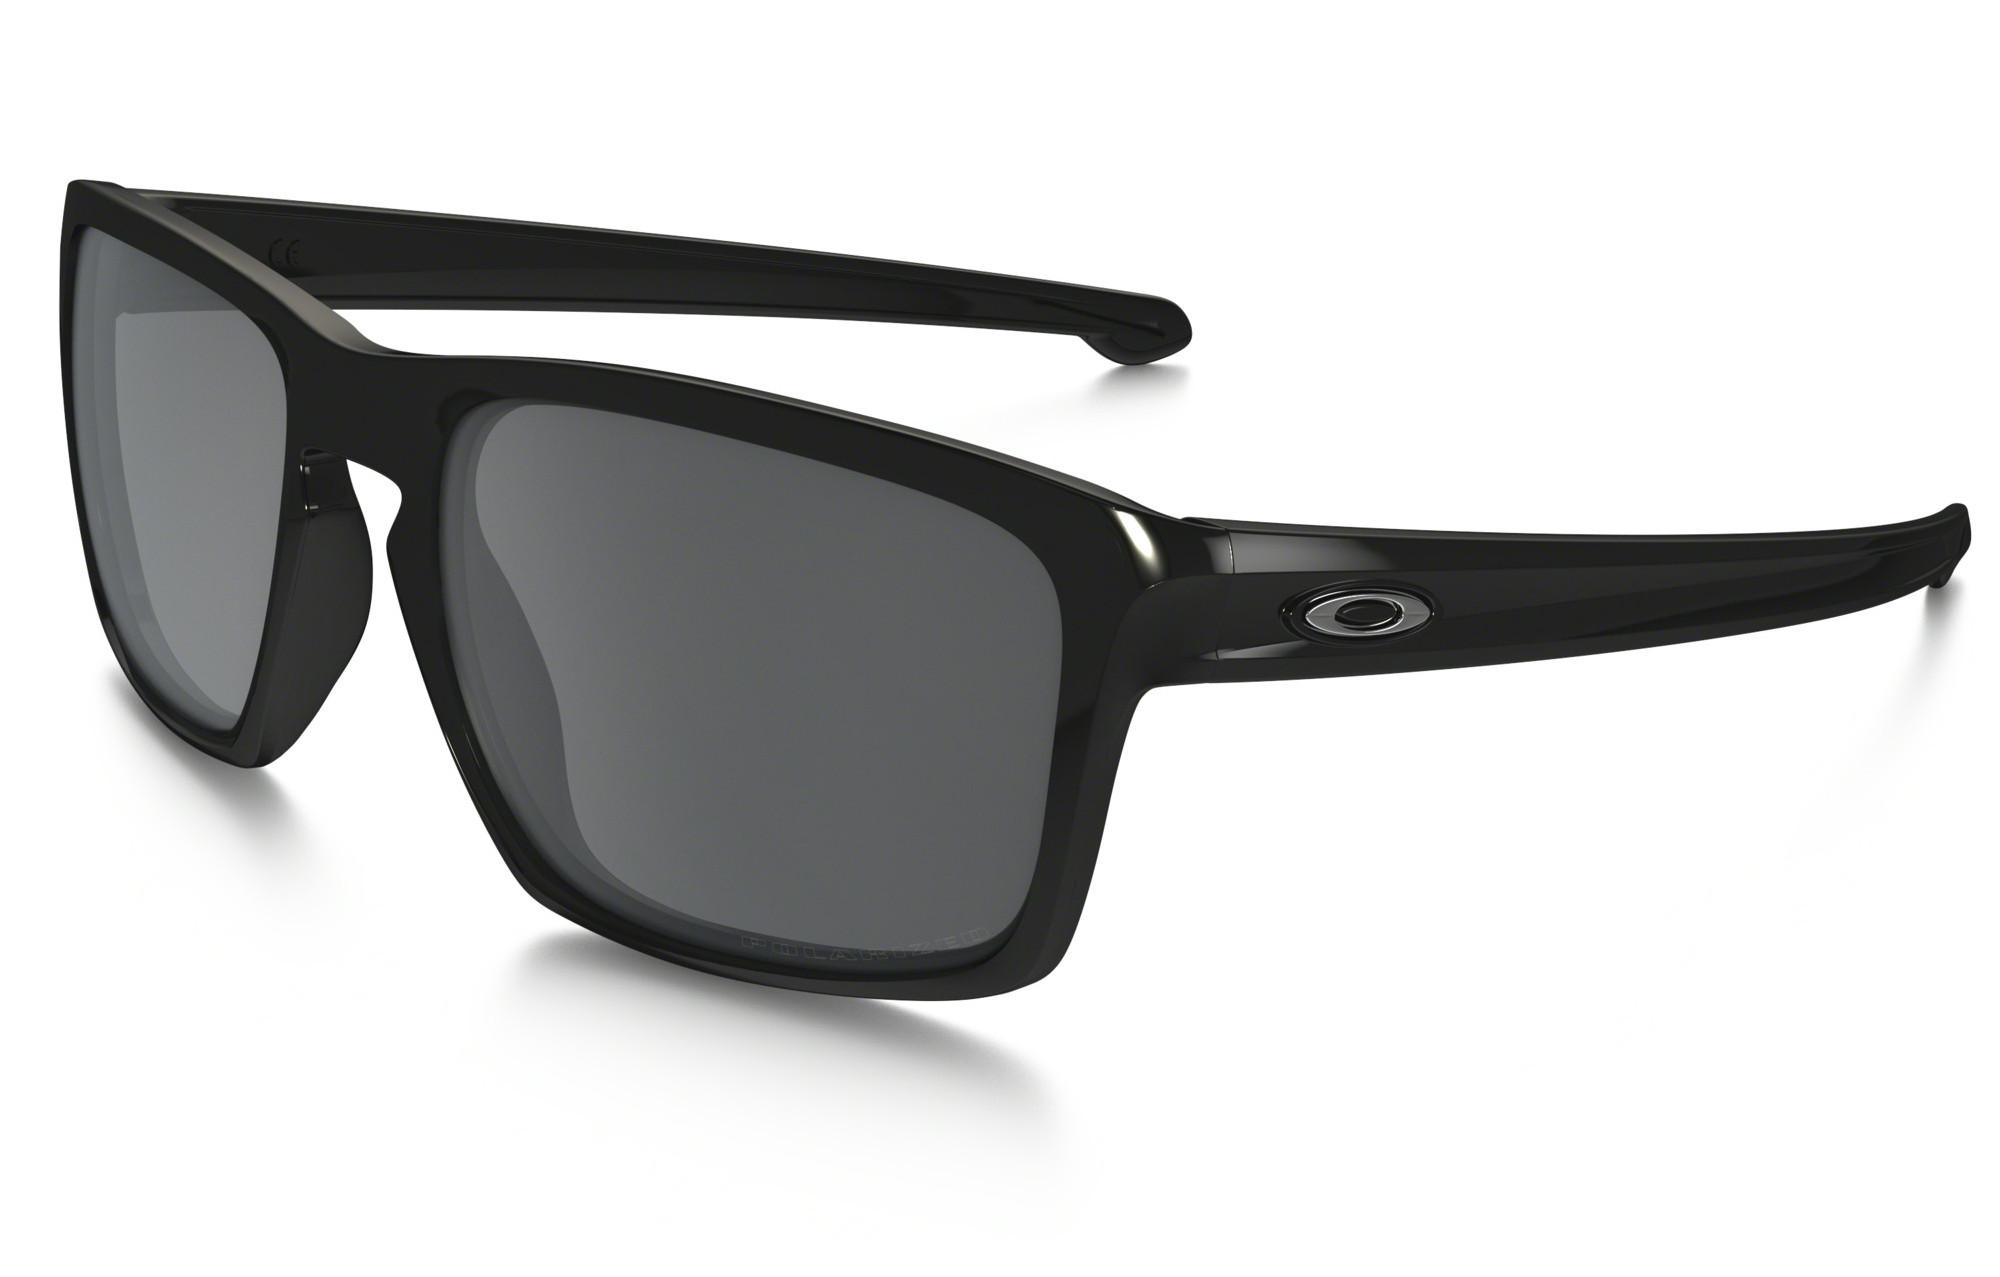 289a292c8e Gafas Oakley SLIVER black black Polarized OO9262-09 | Alltricks.es